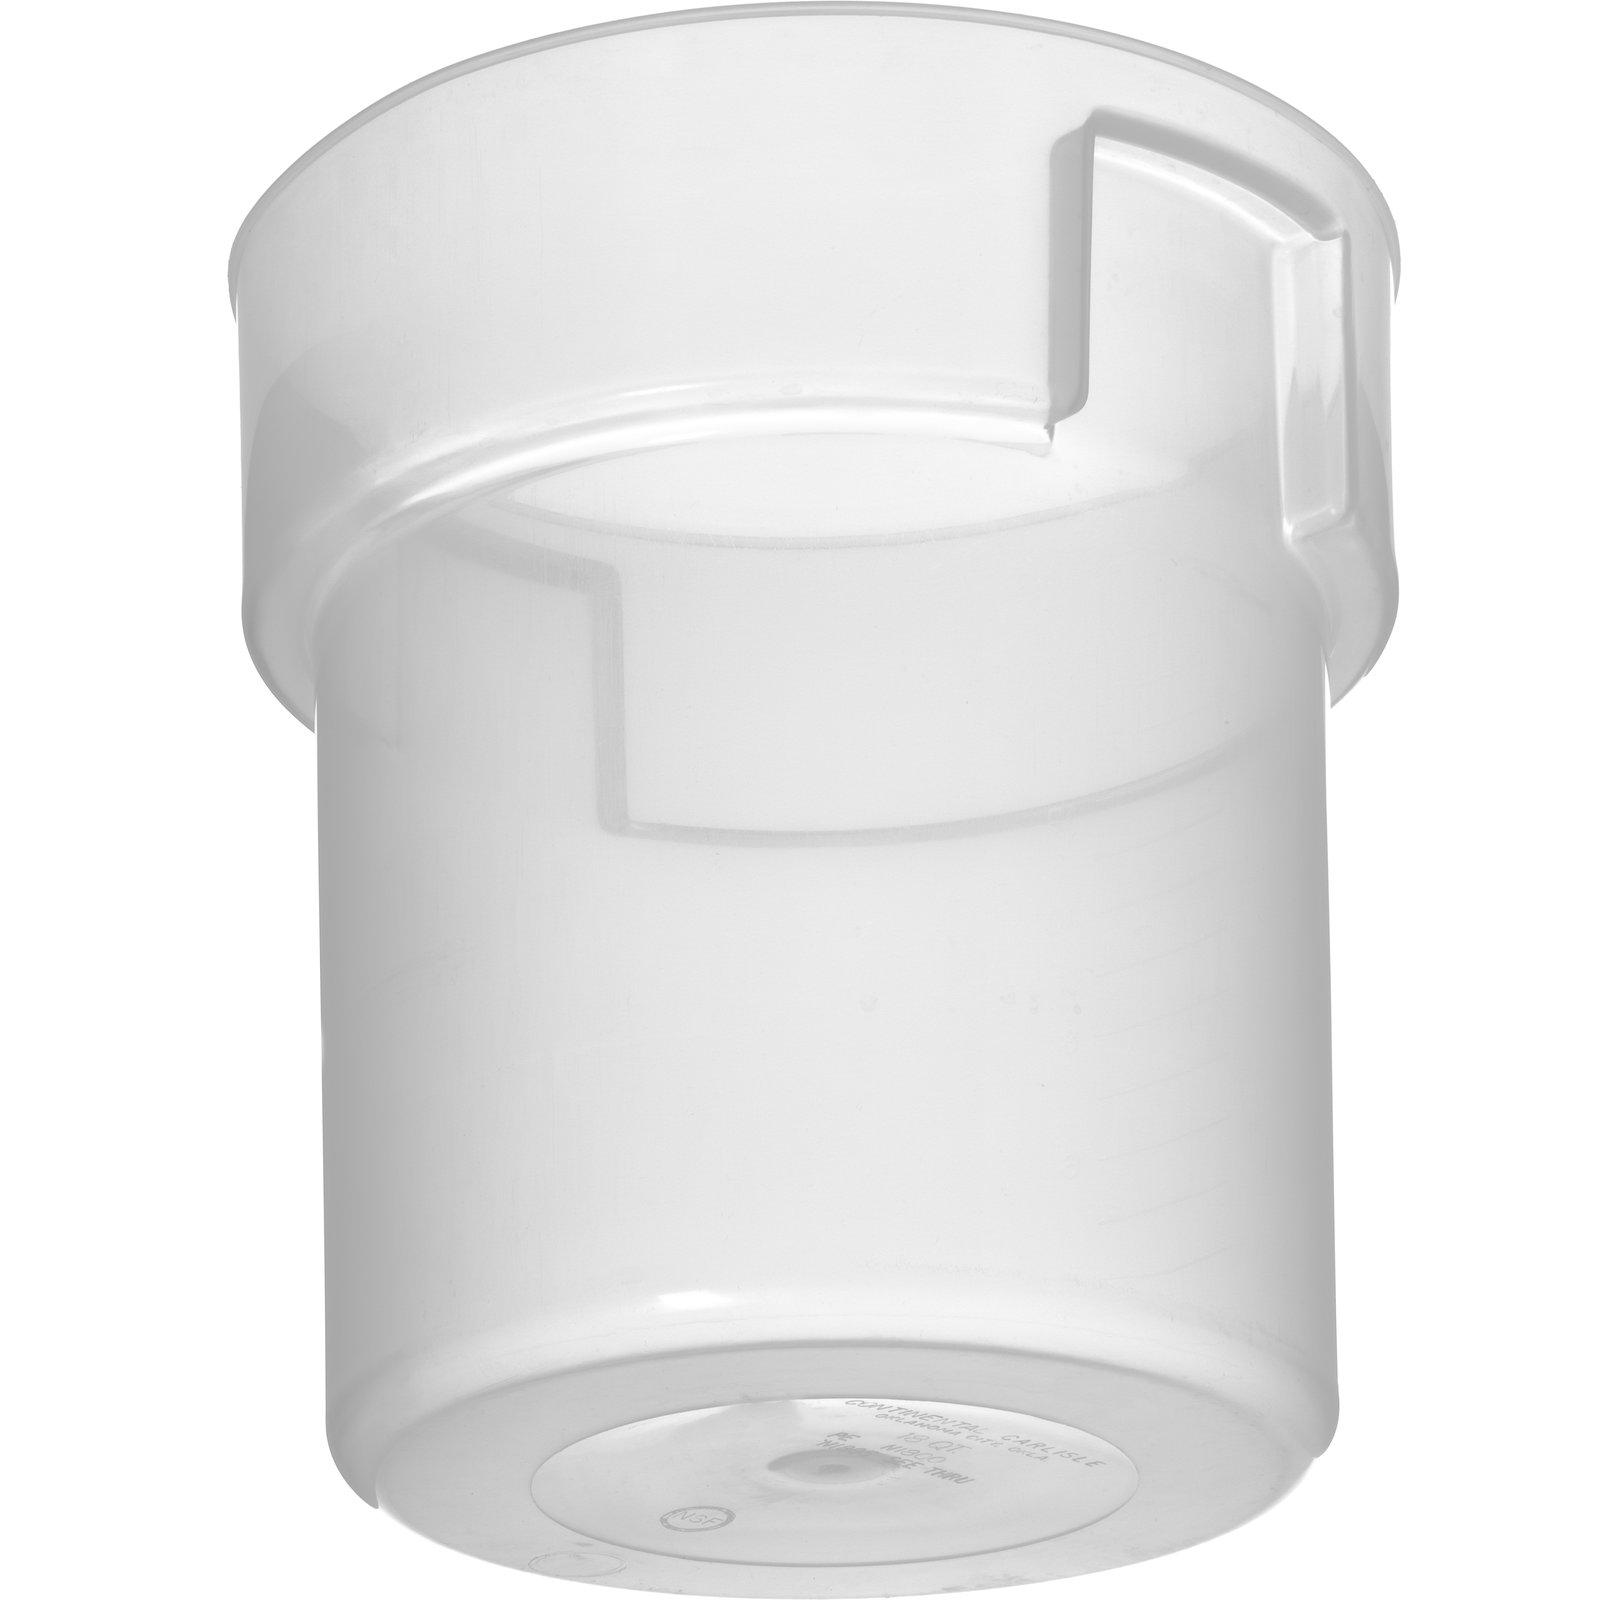 180530 Bains Marie Food Storage Container 18 Qt Translucent